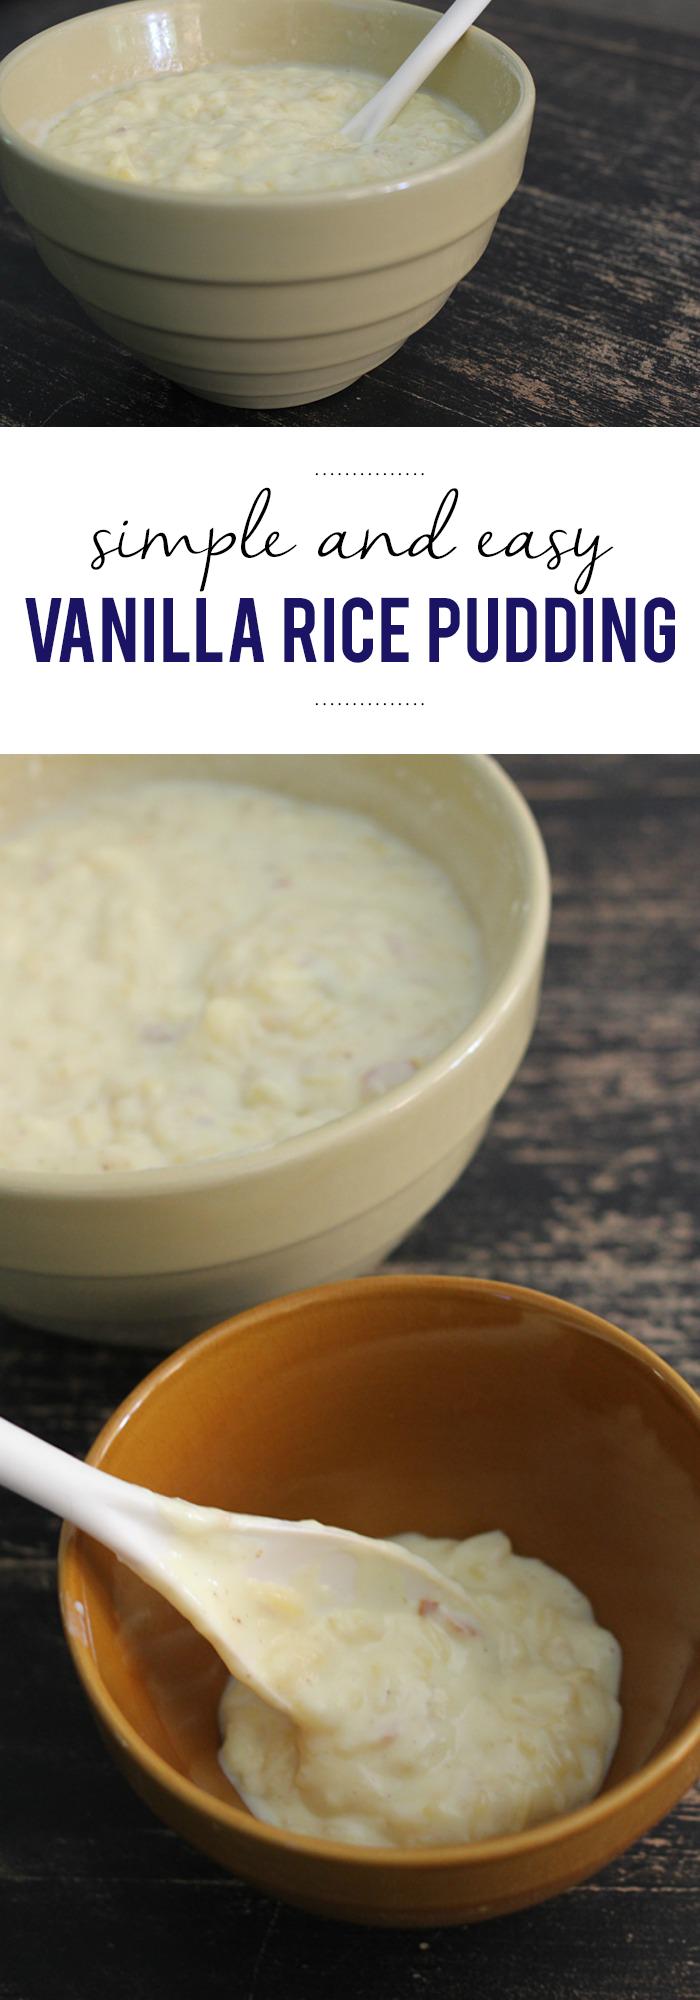 ricepudding11